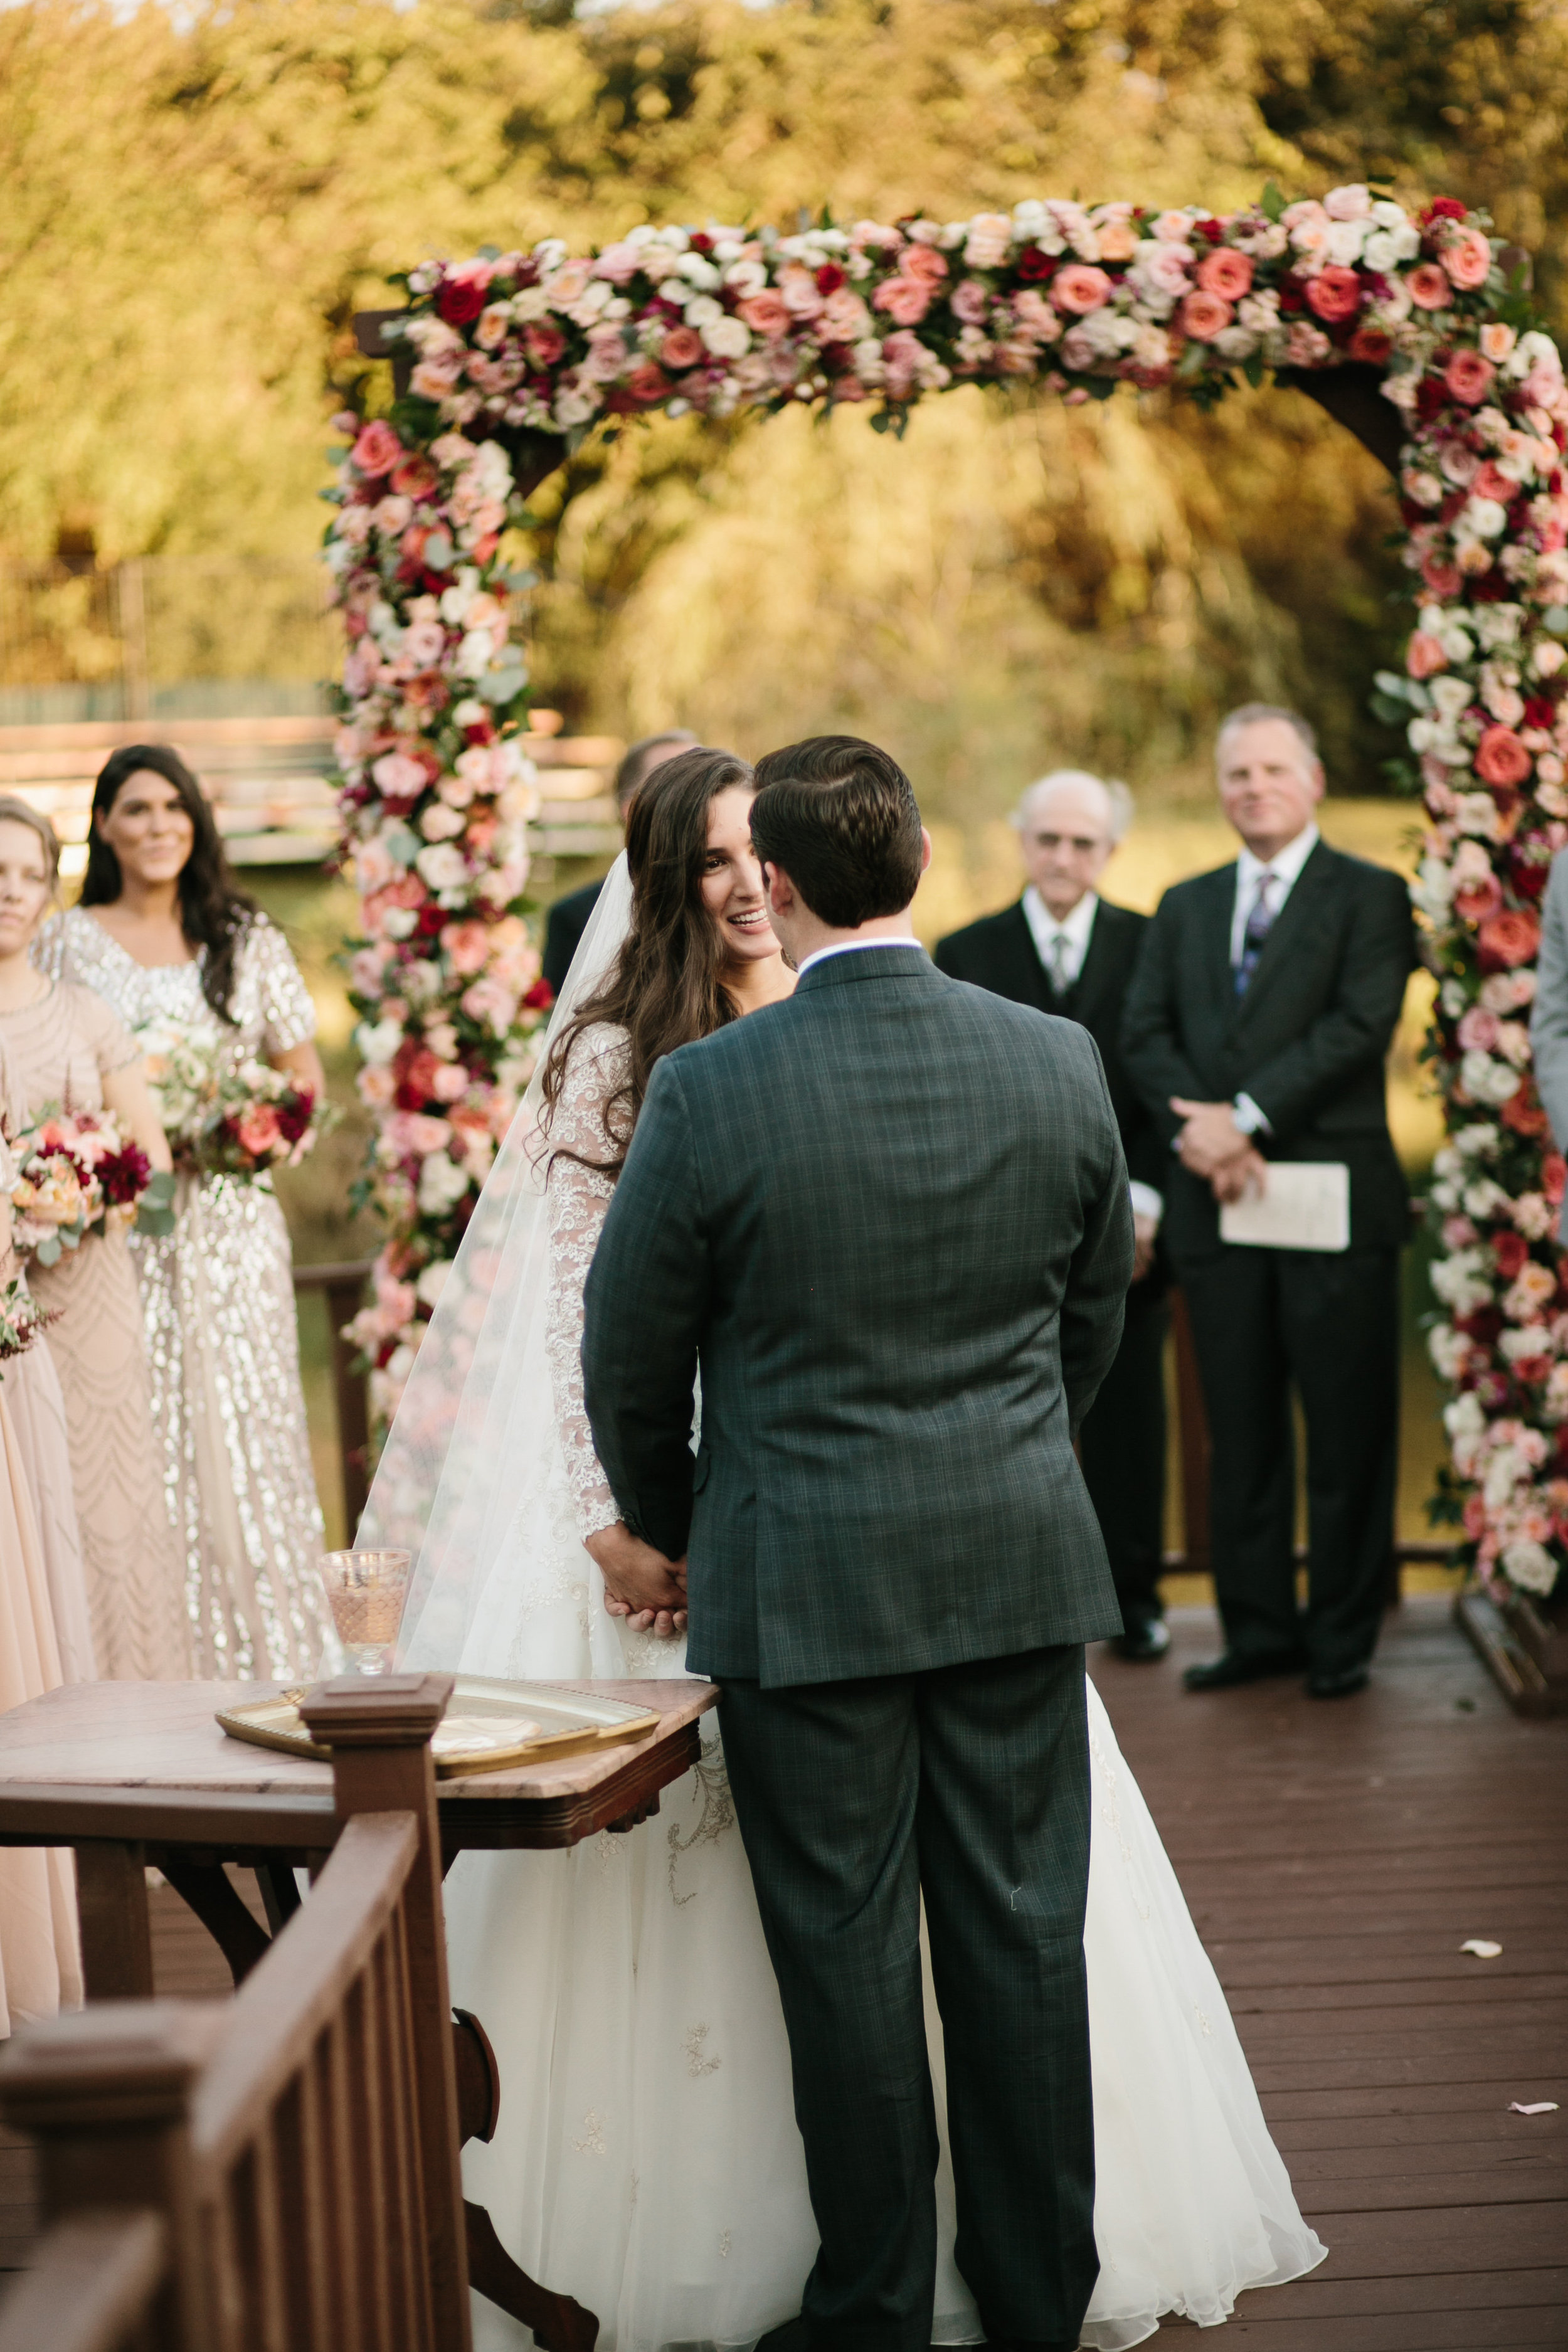 shannon_rose_rent_my_dust_fall_wedding_ (15).jpg